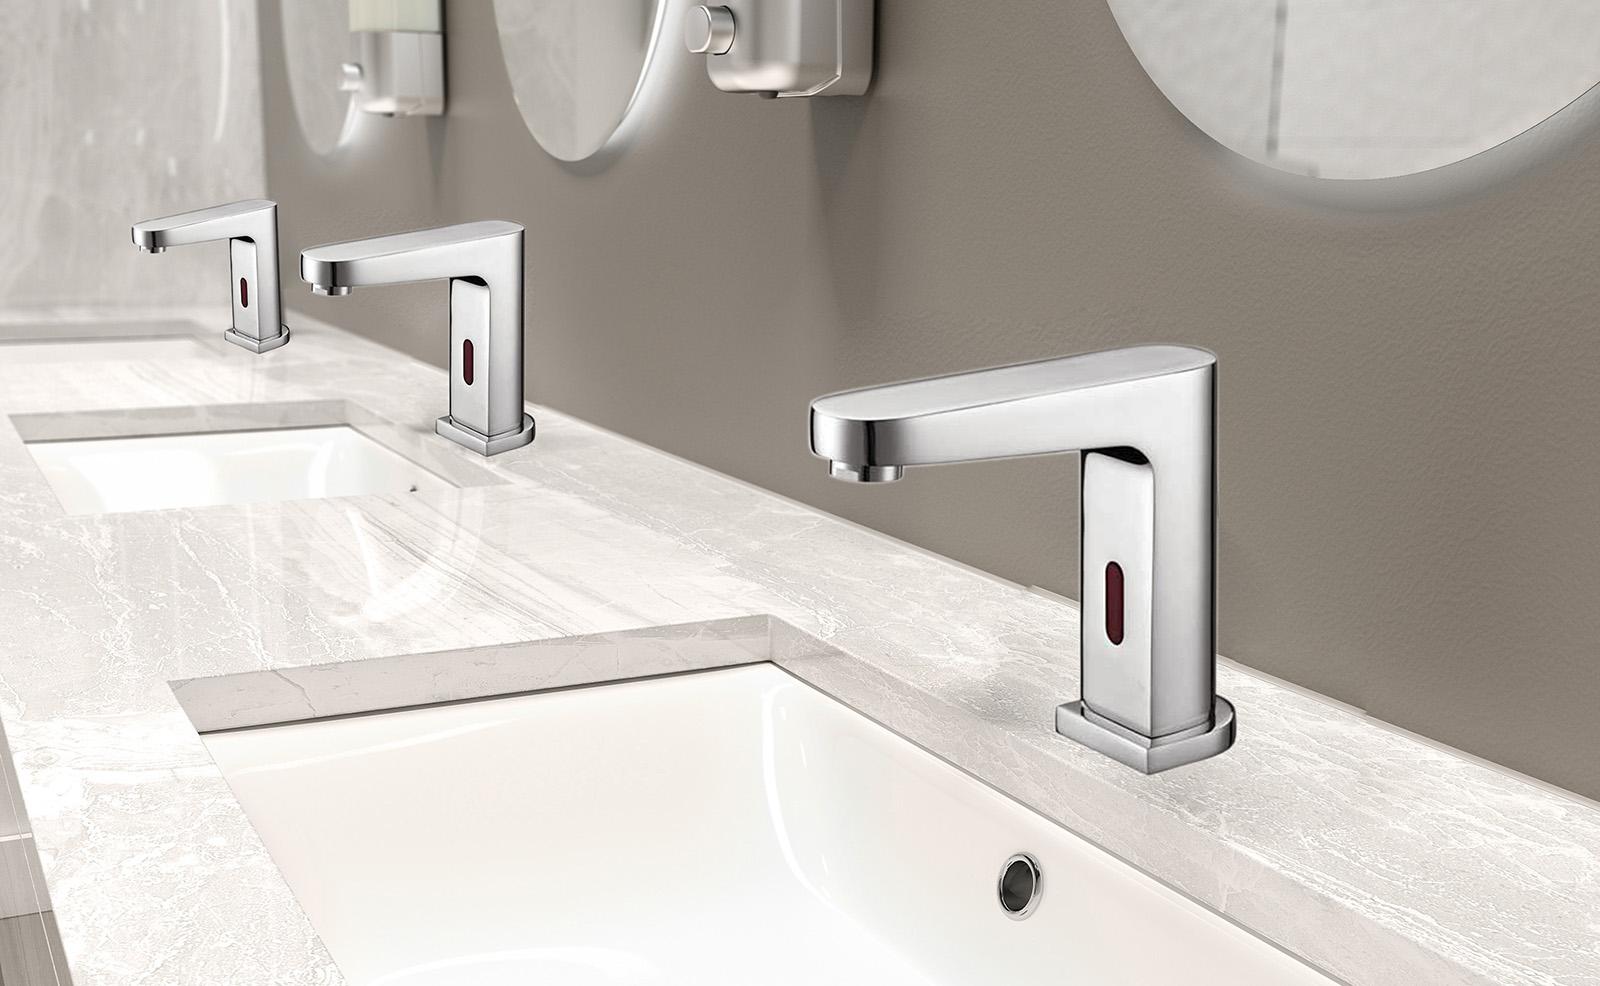 elena touchless basin automatic commercial sensor faucet